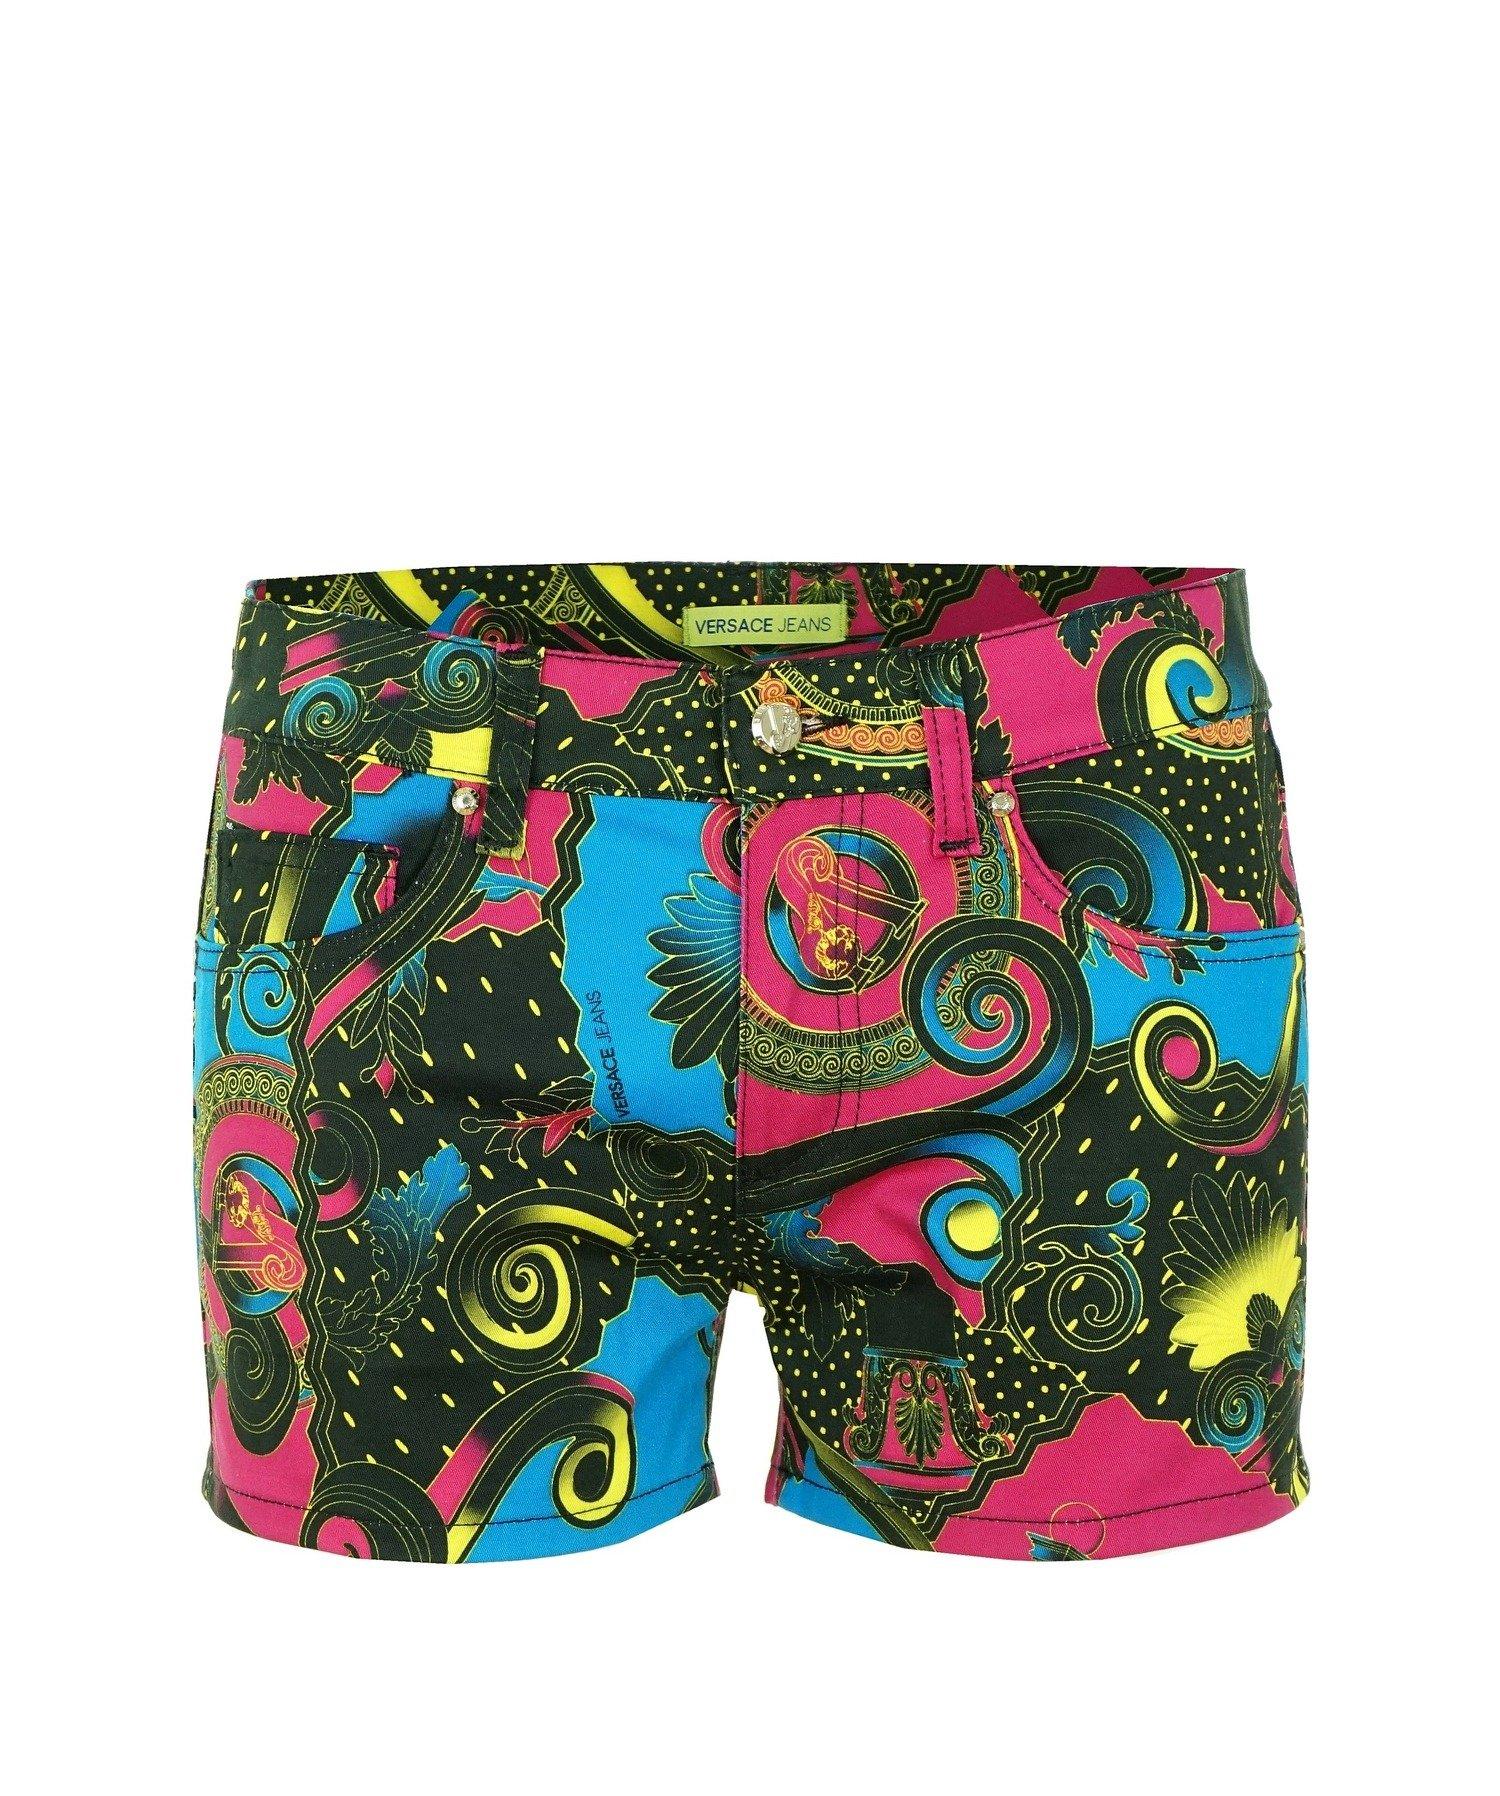 Jeans Shorts Mehrfarbig Damen Versace A3hnb191 Hose Kurze Women Ybf6vIy7g